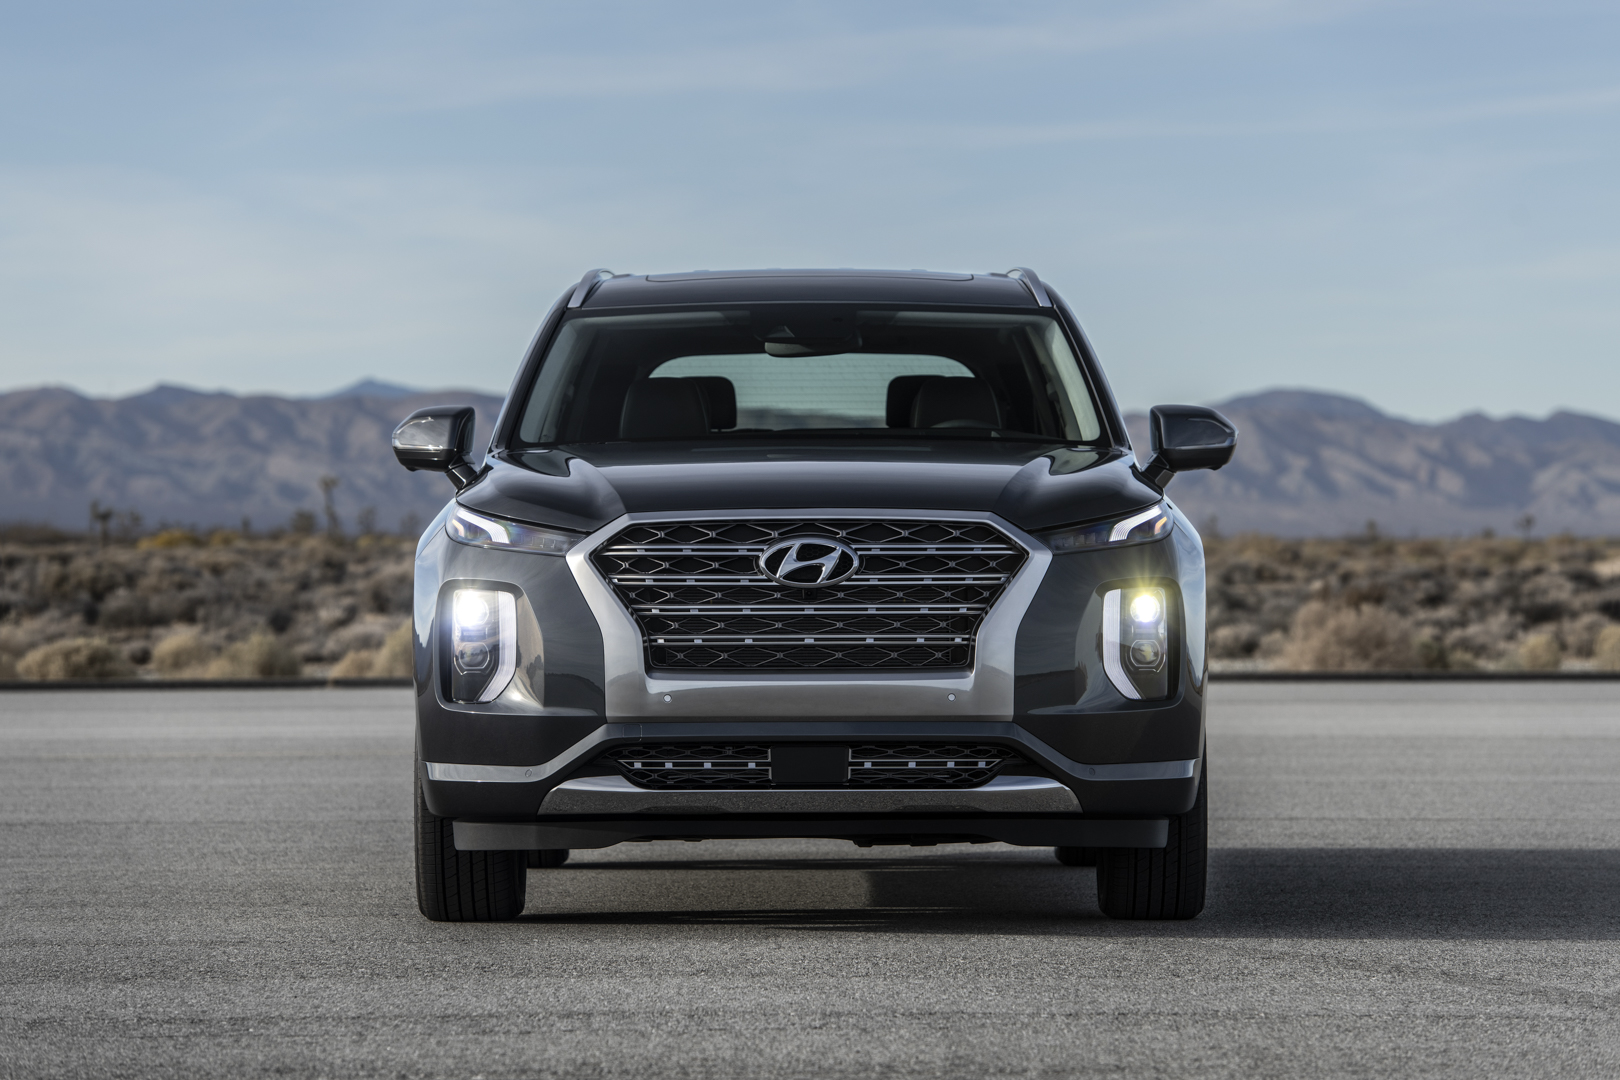 2018 La Auto Show Hyundai Palisade Budget Three Row Beast